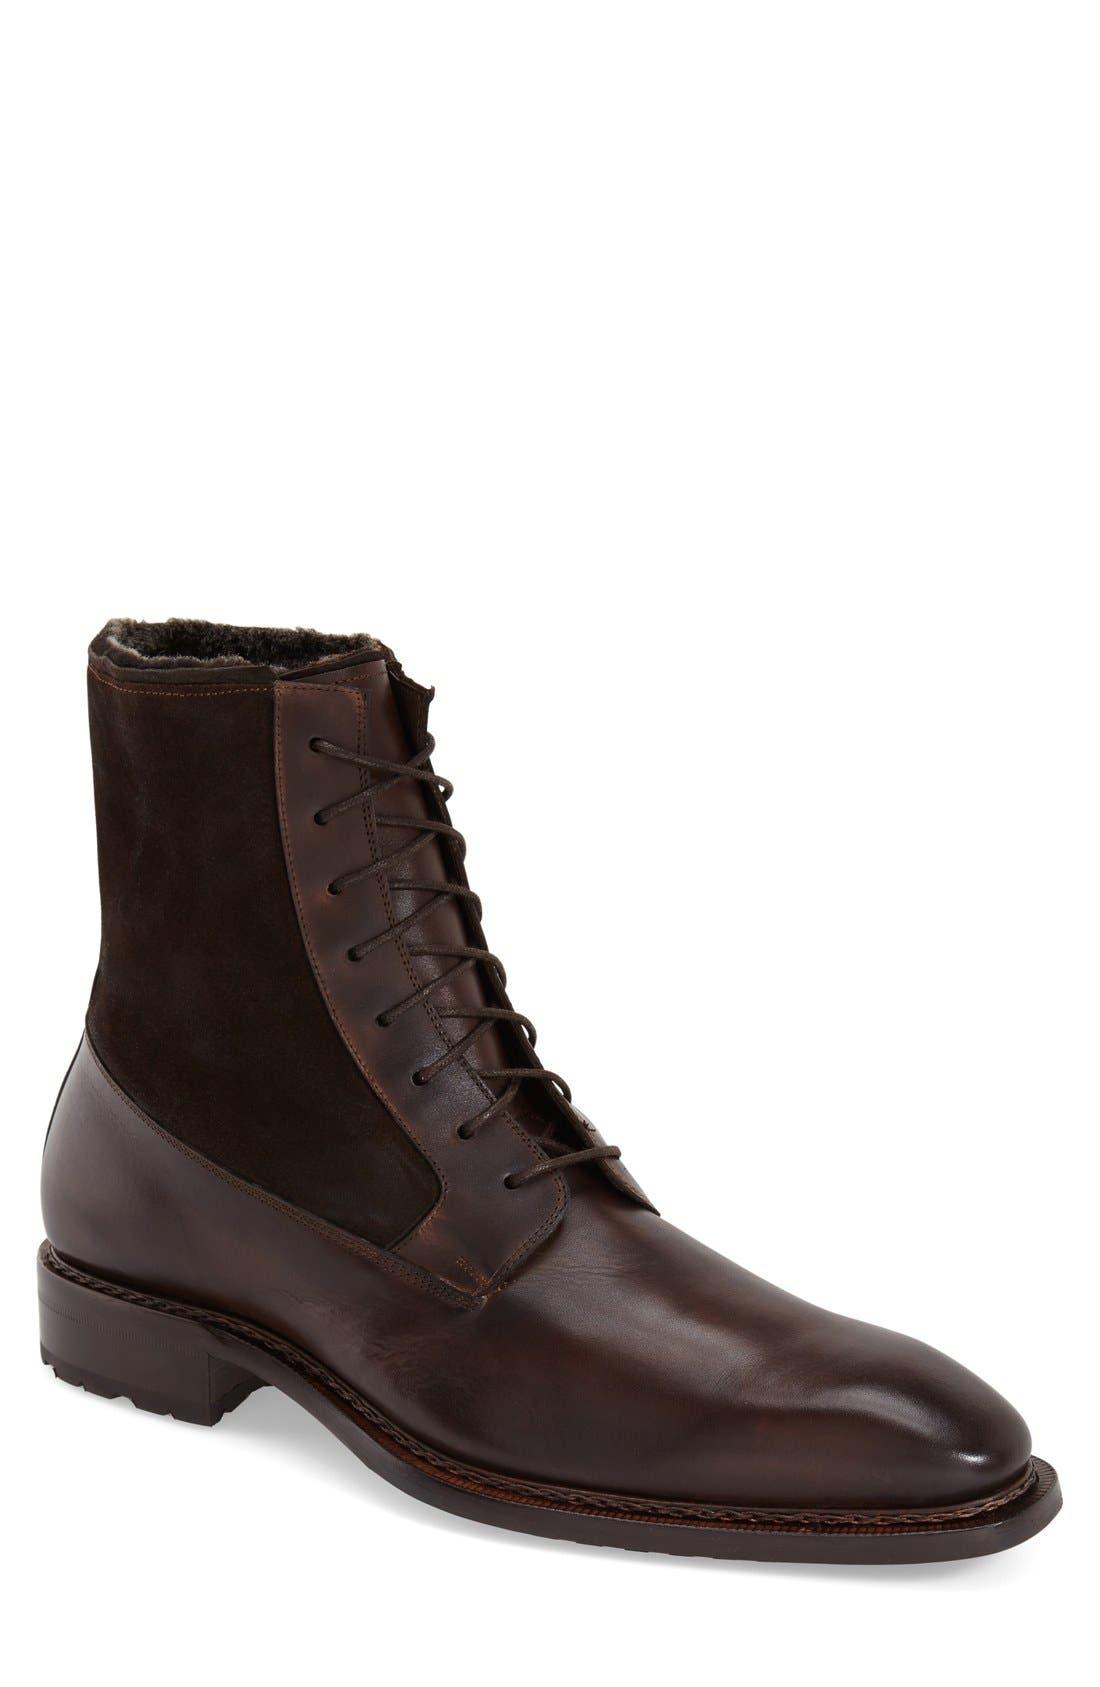 'Luzern' Genuine Shearling Boot,                             Main thumbnail 1, color,